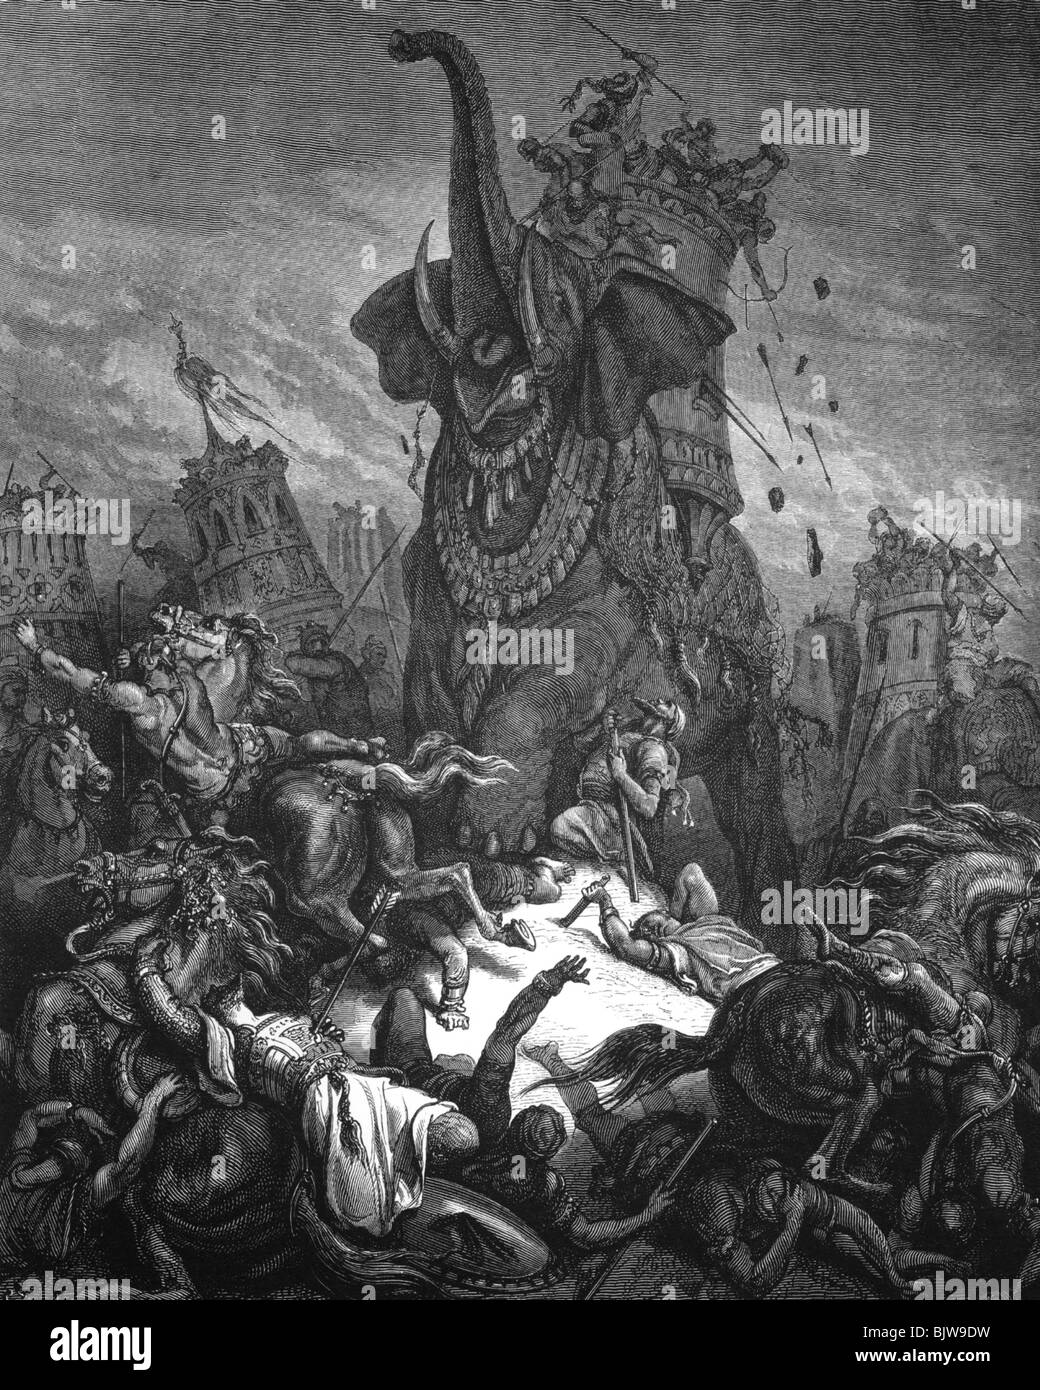 religion biblical scenes quotdeath of eleazarquot wood